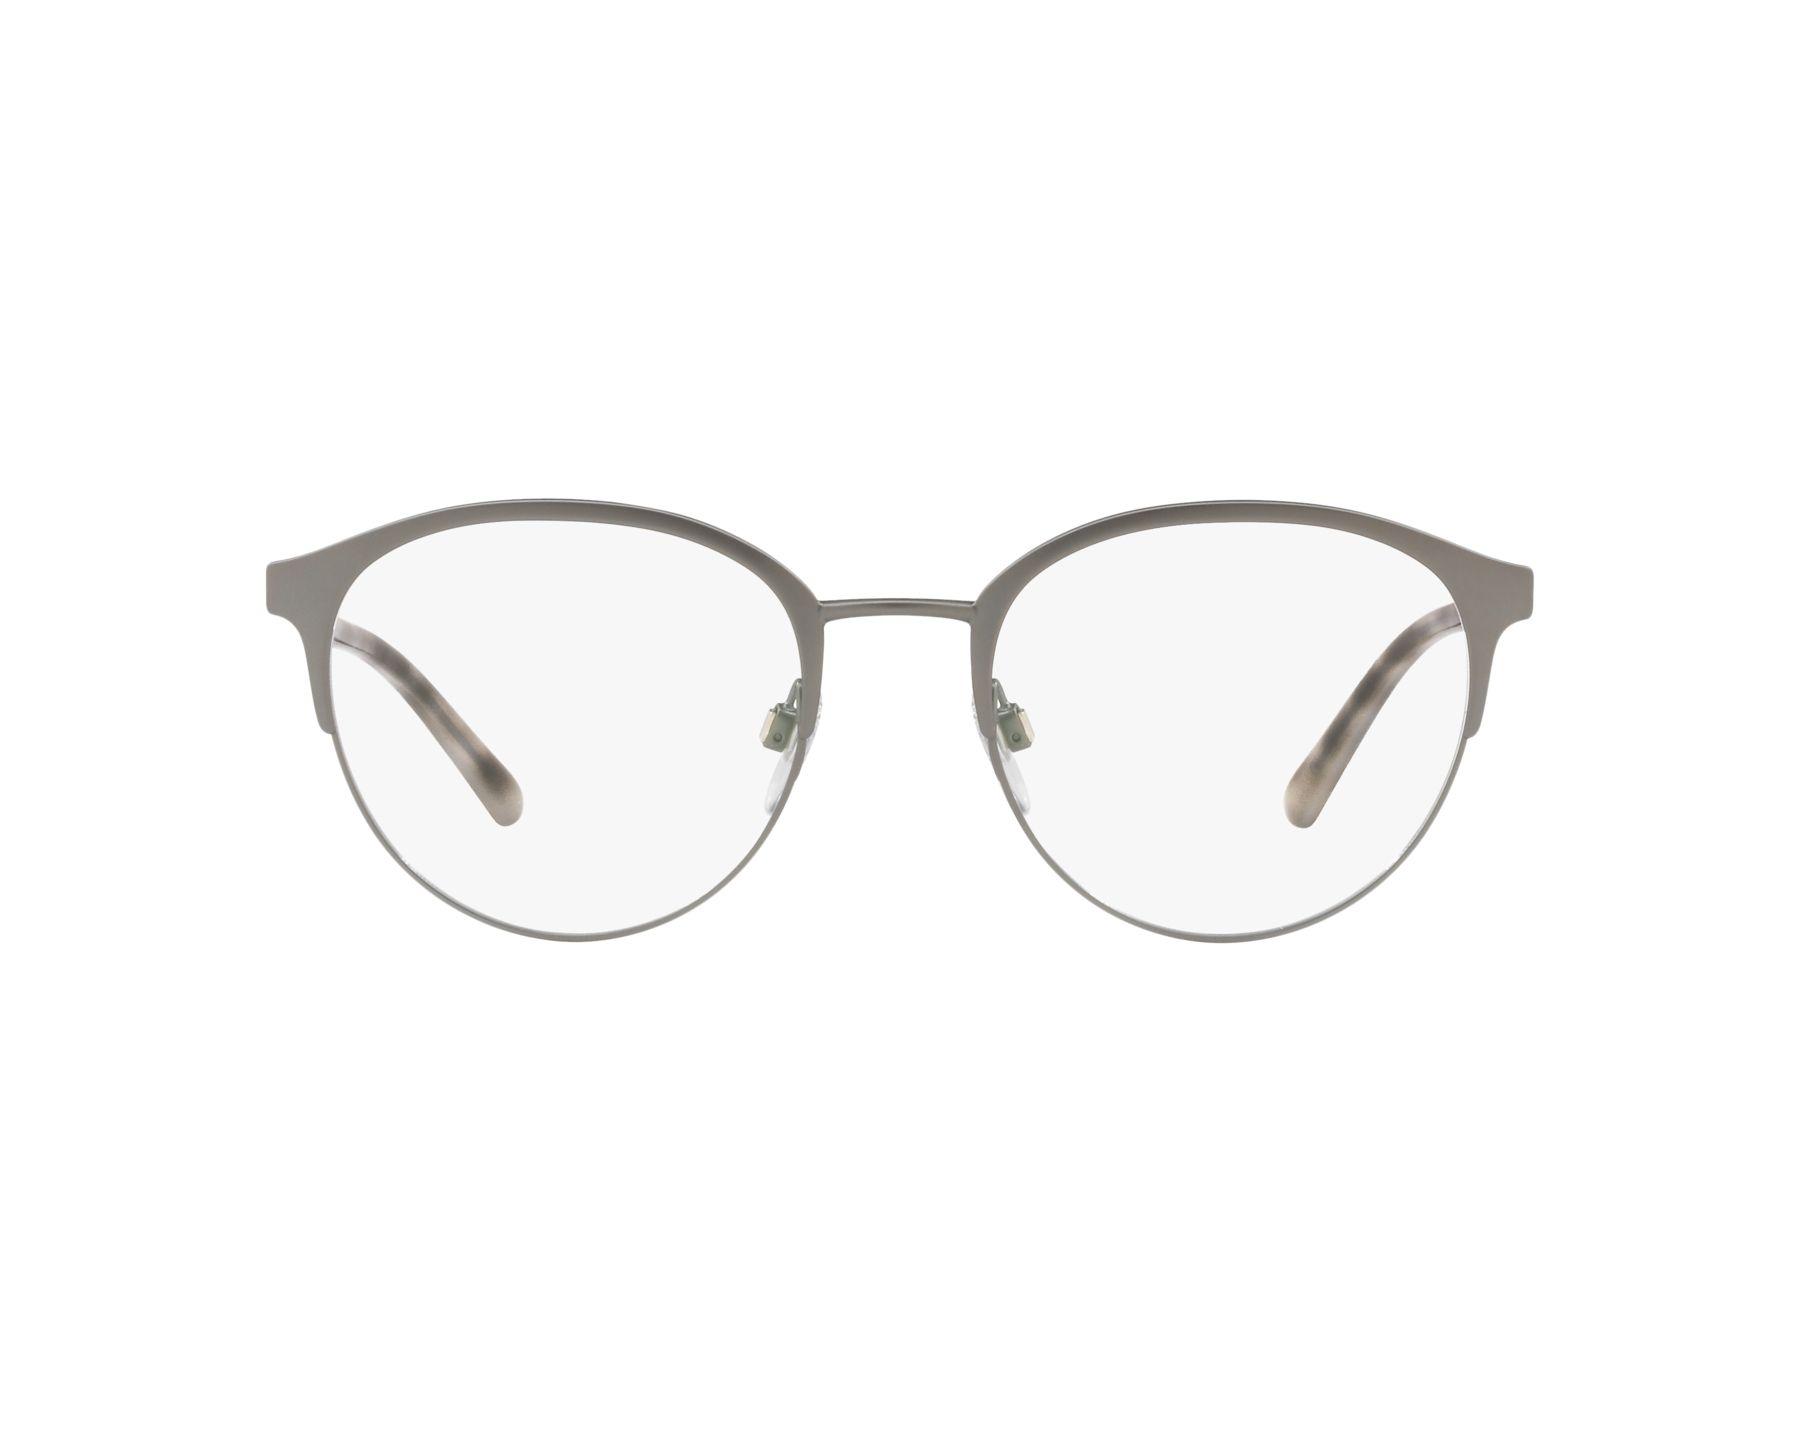 eyeglasses Burberry BE-1318 1014 51-19 Gun Grey 360 degree view 1